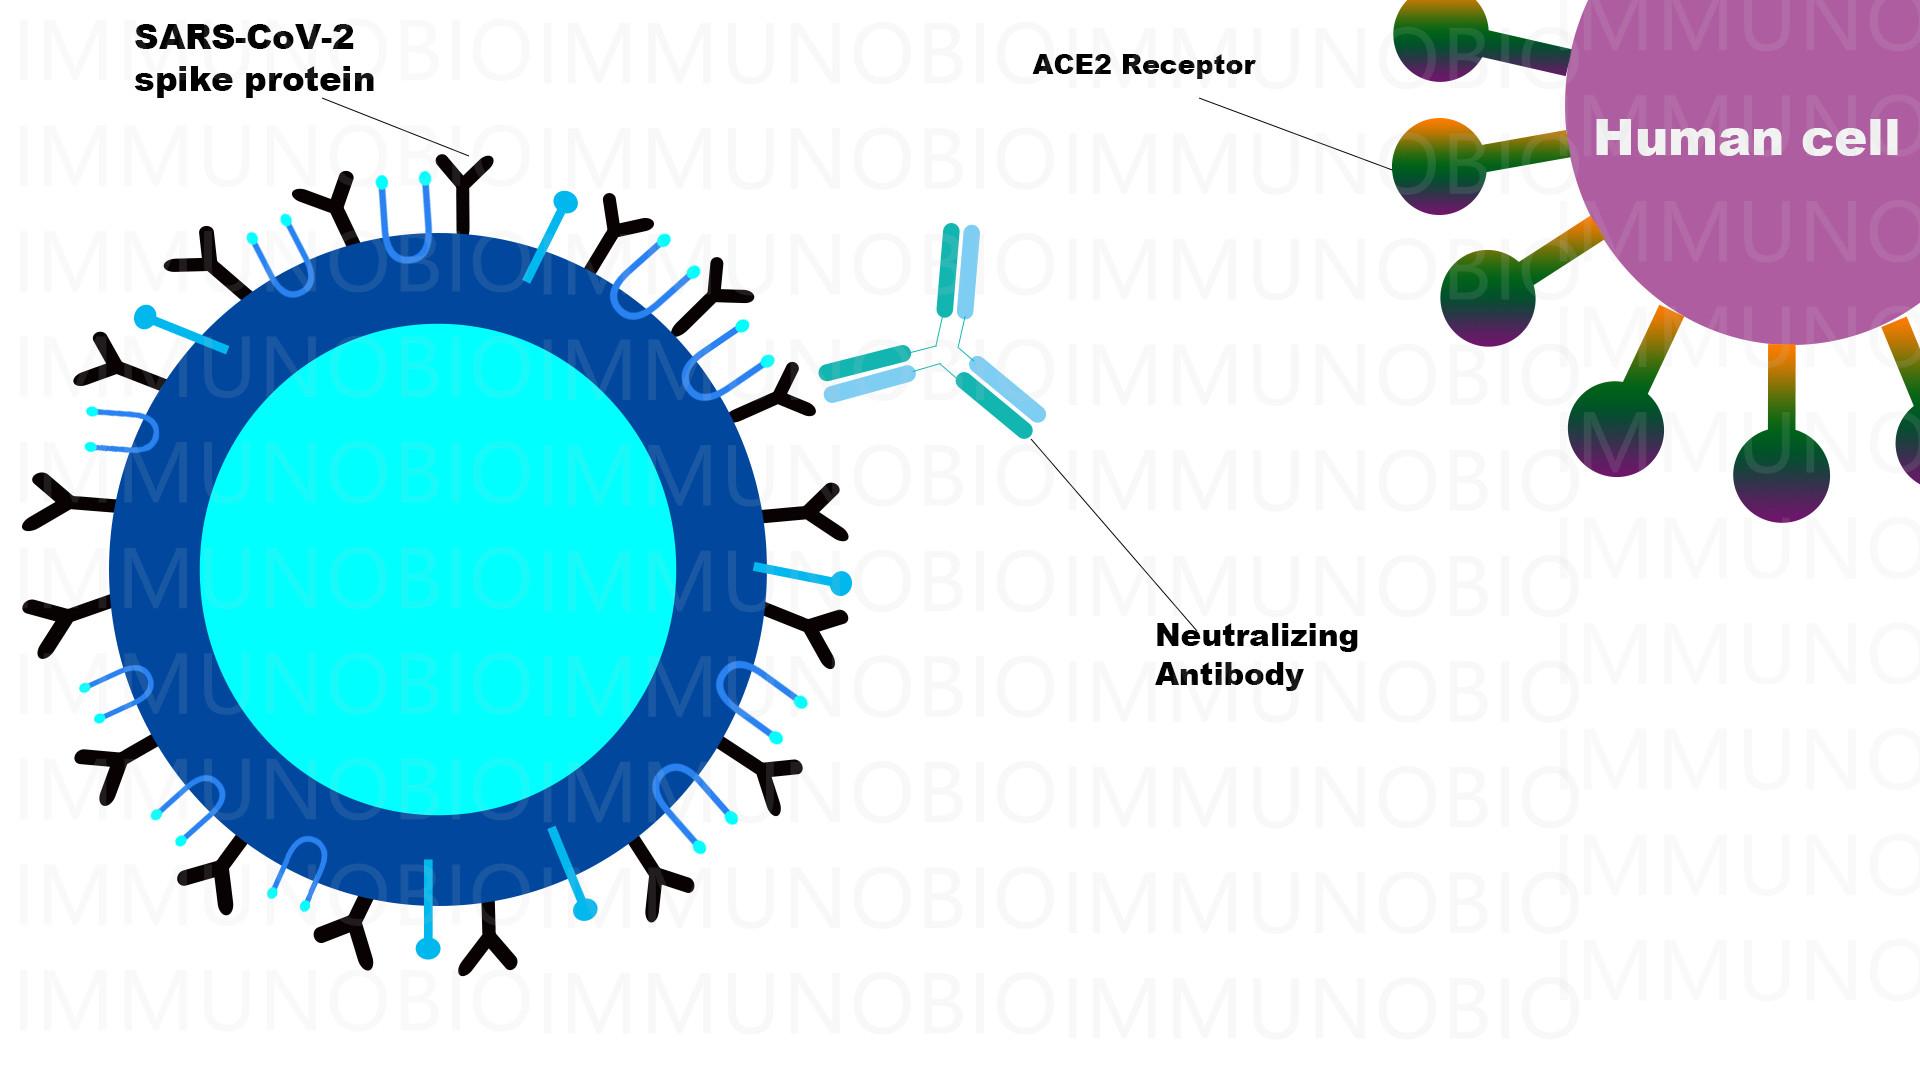 COVID 19 antibody test